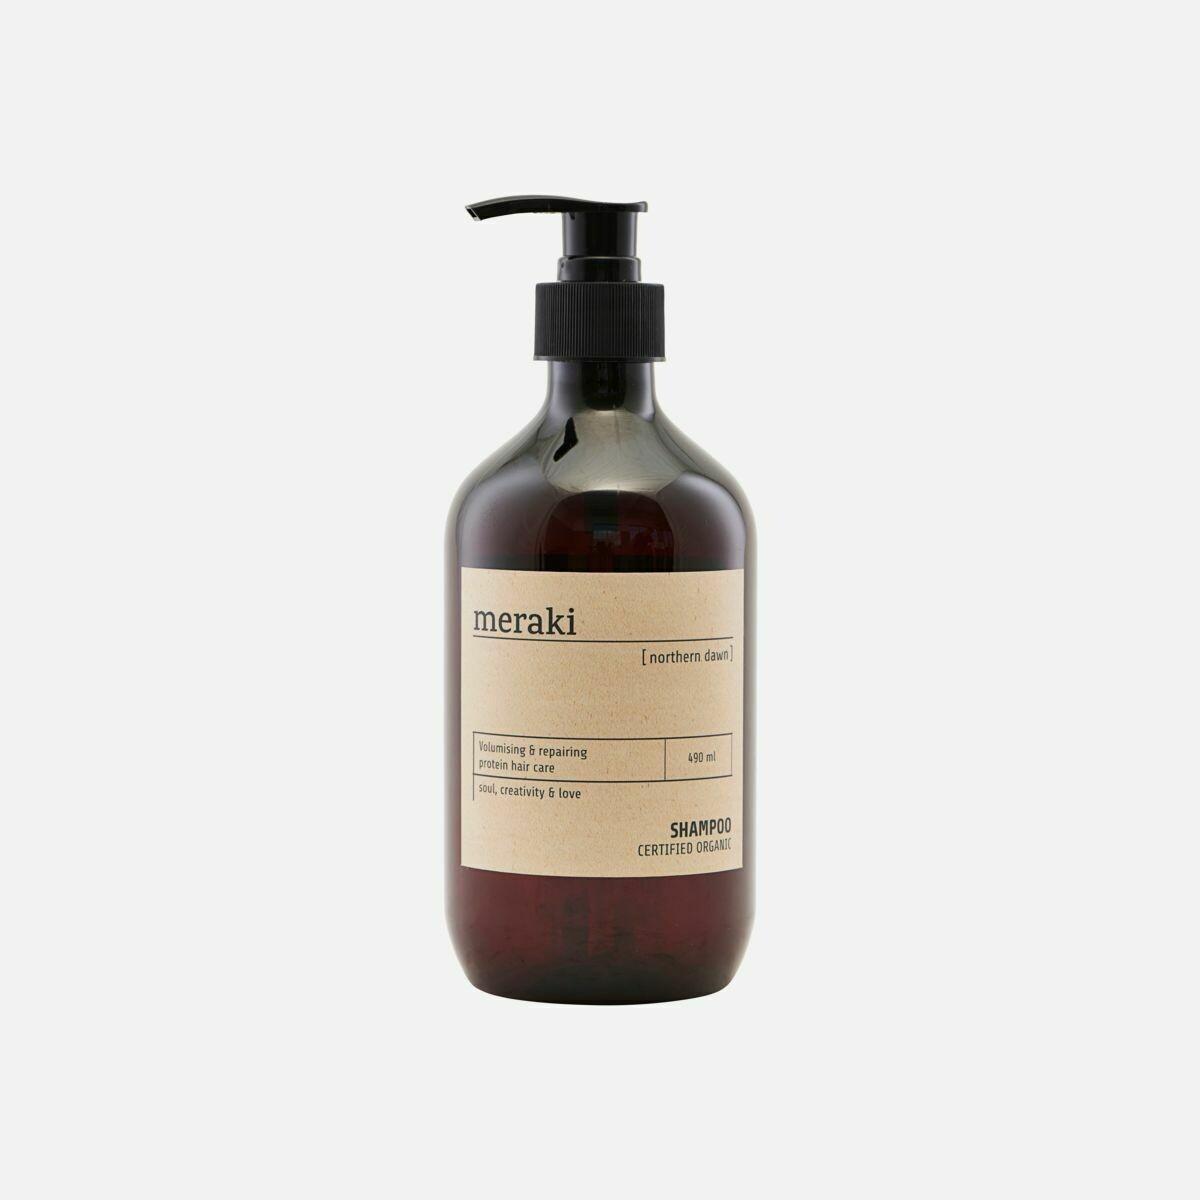 Shampoo, Northern dawn